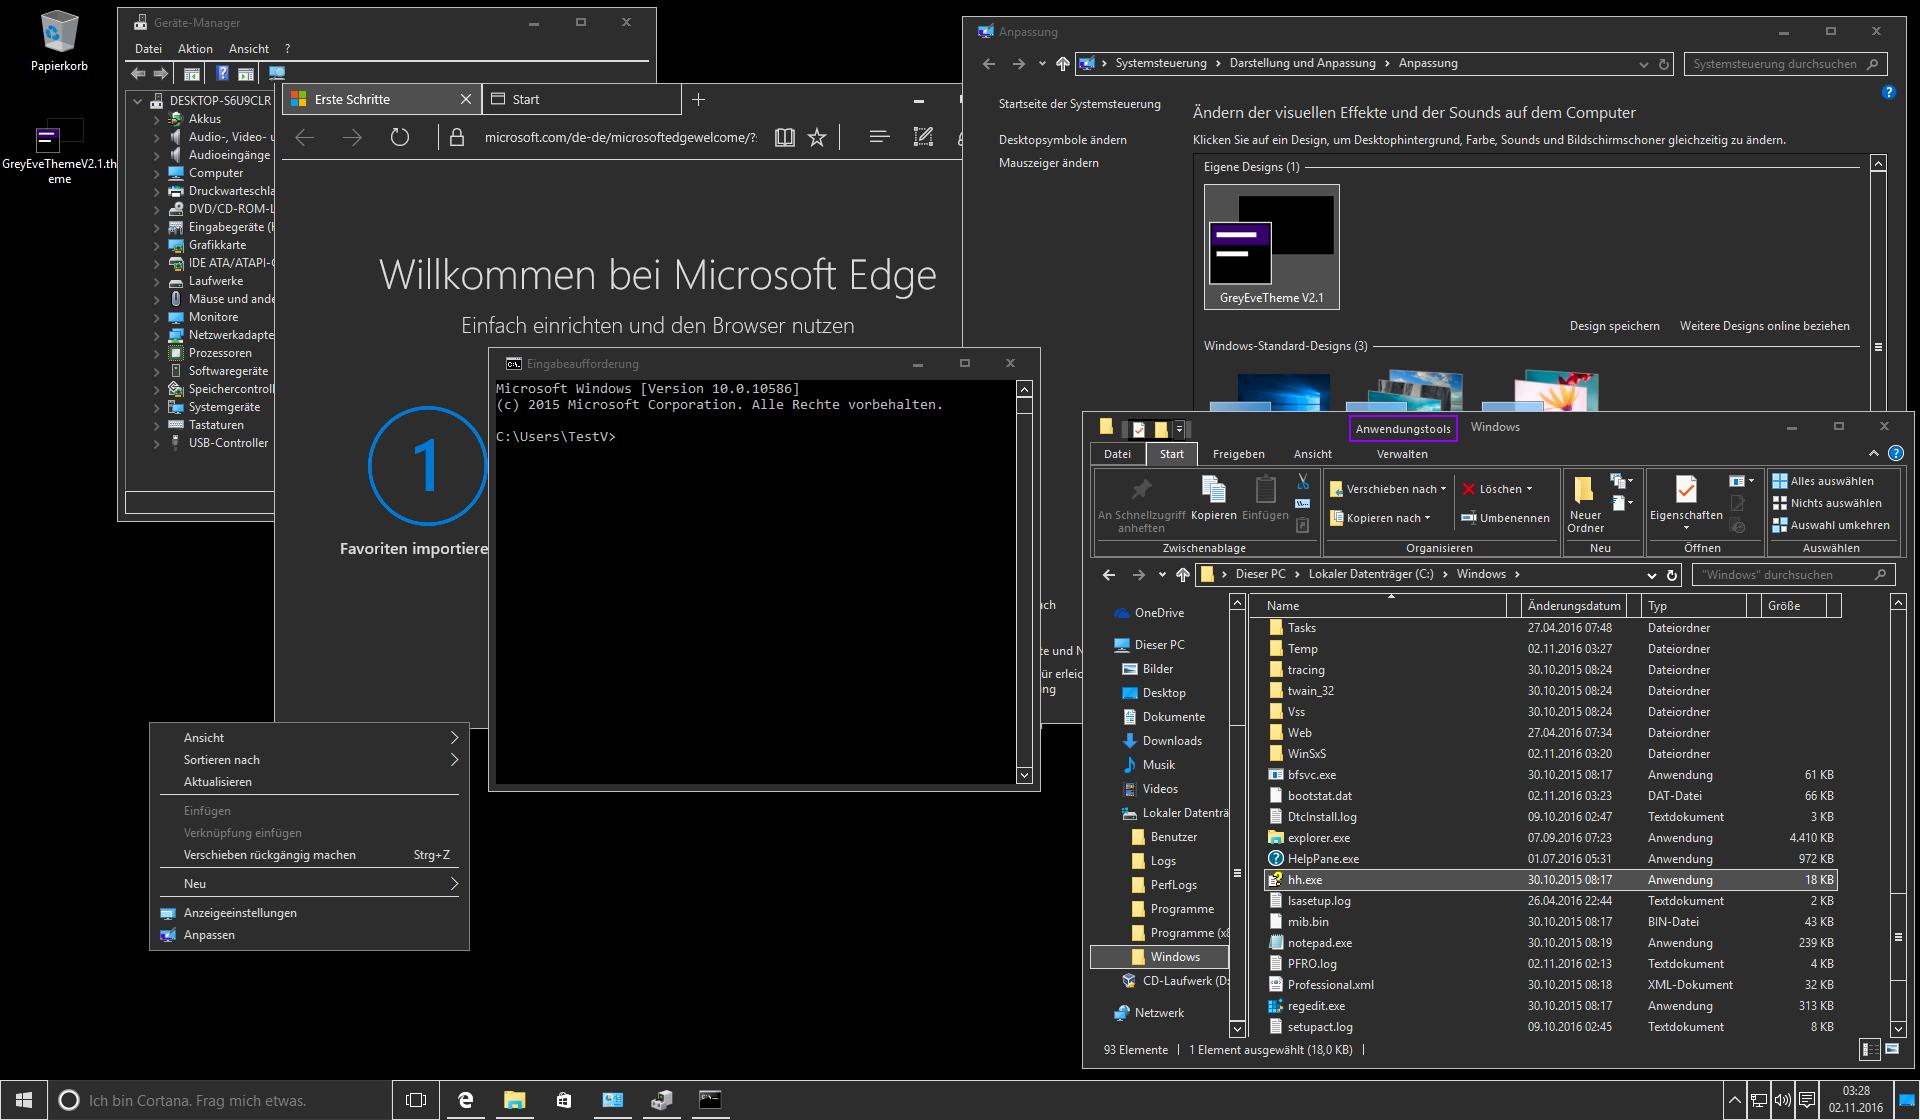 GreyEveTheme FINAL- Windows 10 High Contrast Theme by eversins